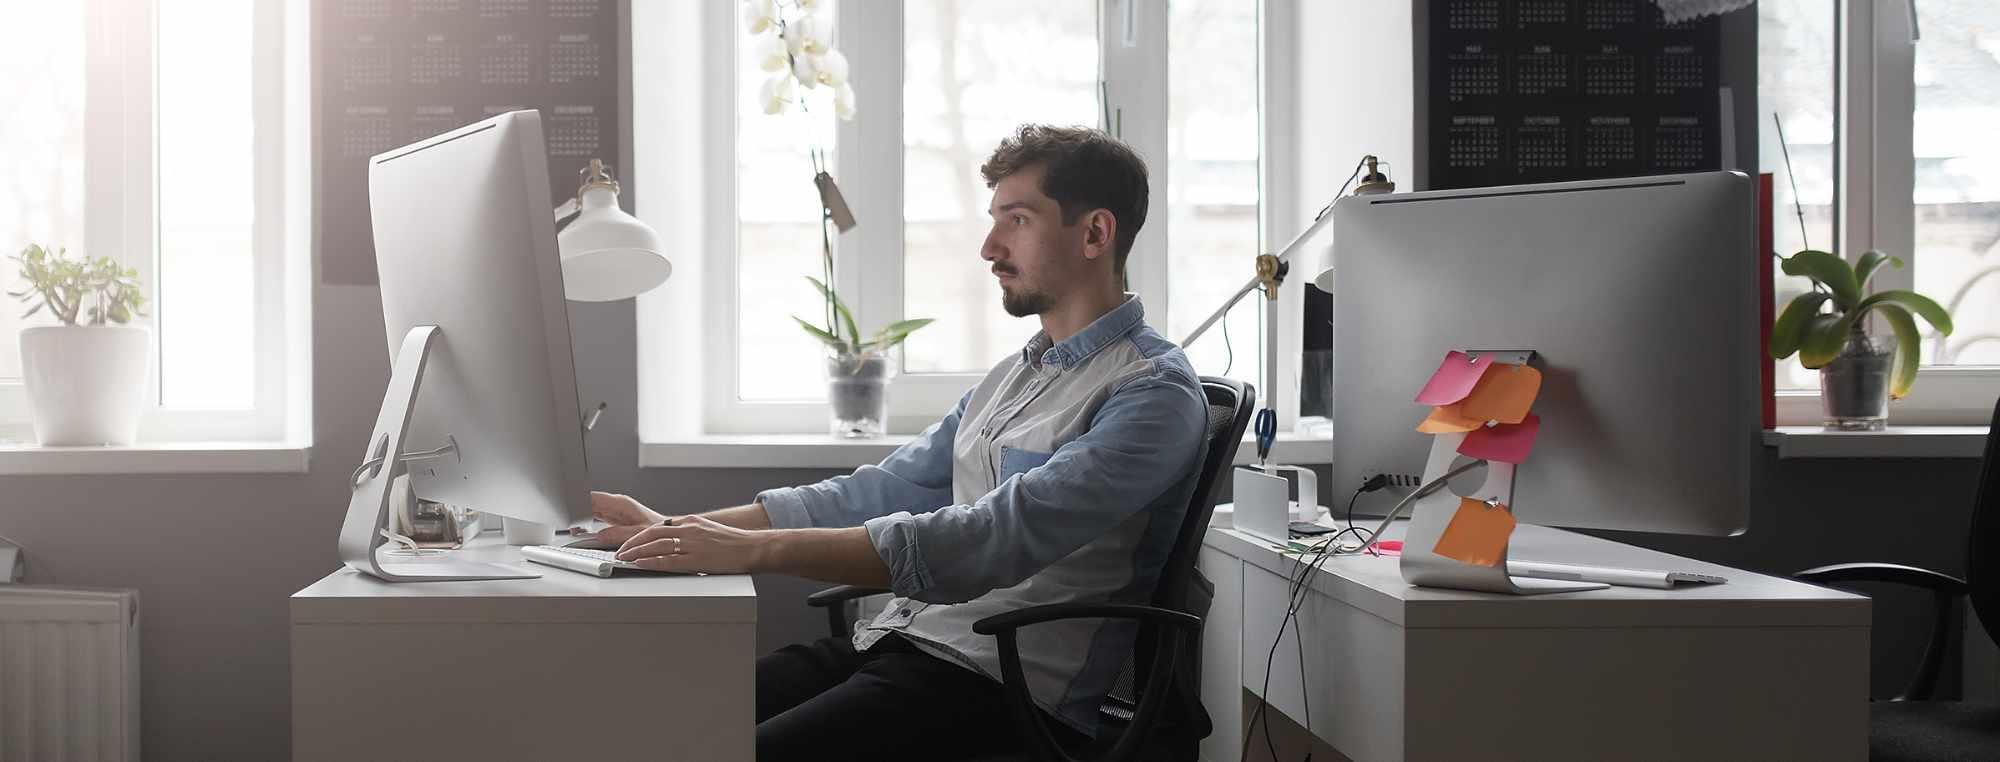 a-man-working-in-a-modern-design-office-HTGZ68F.jpg